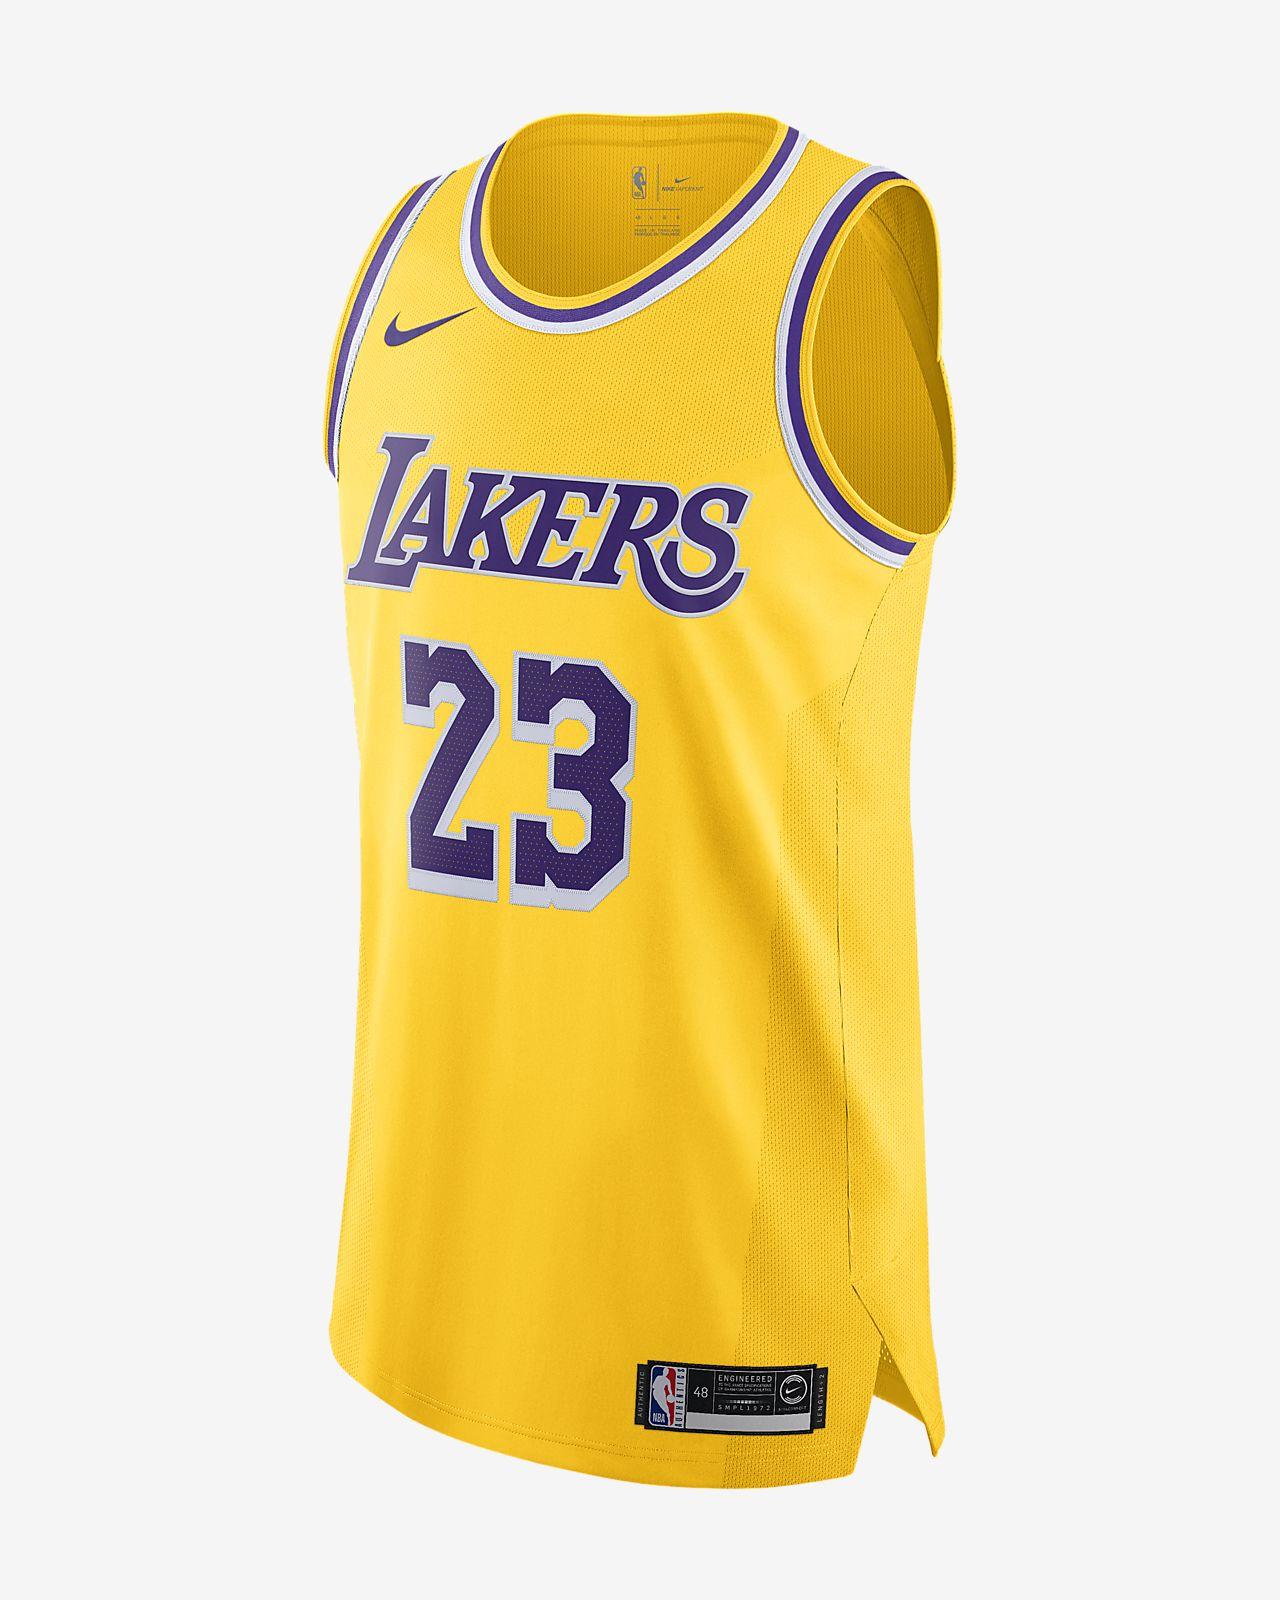 Maillot connecté Nike NBA LeBron James Icon Edition Authentic (Los Angeles Lakers) pour Homme